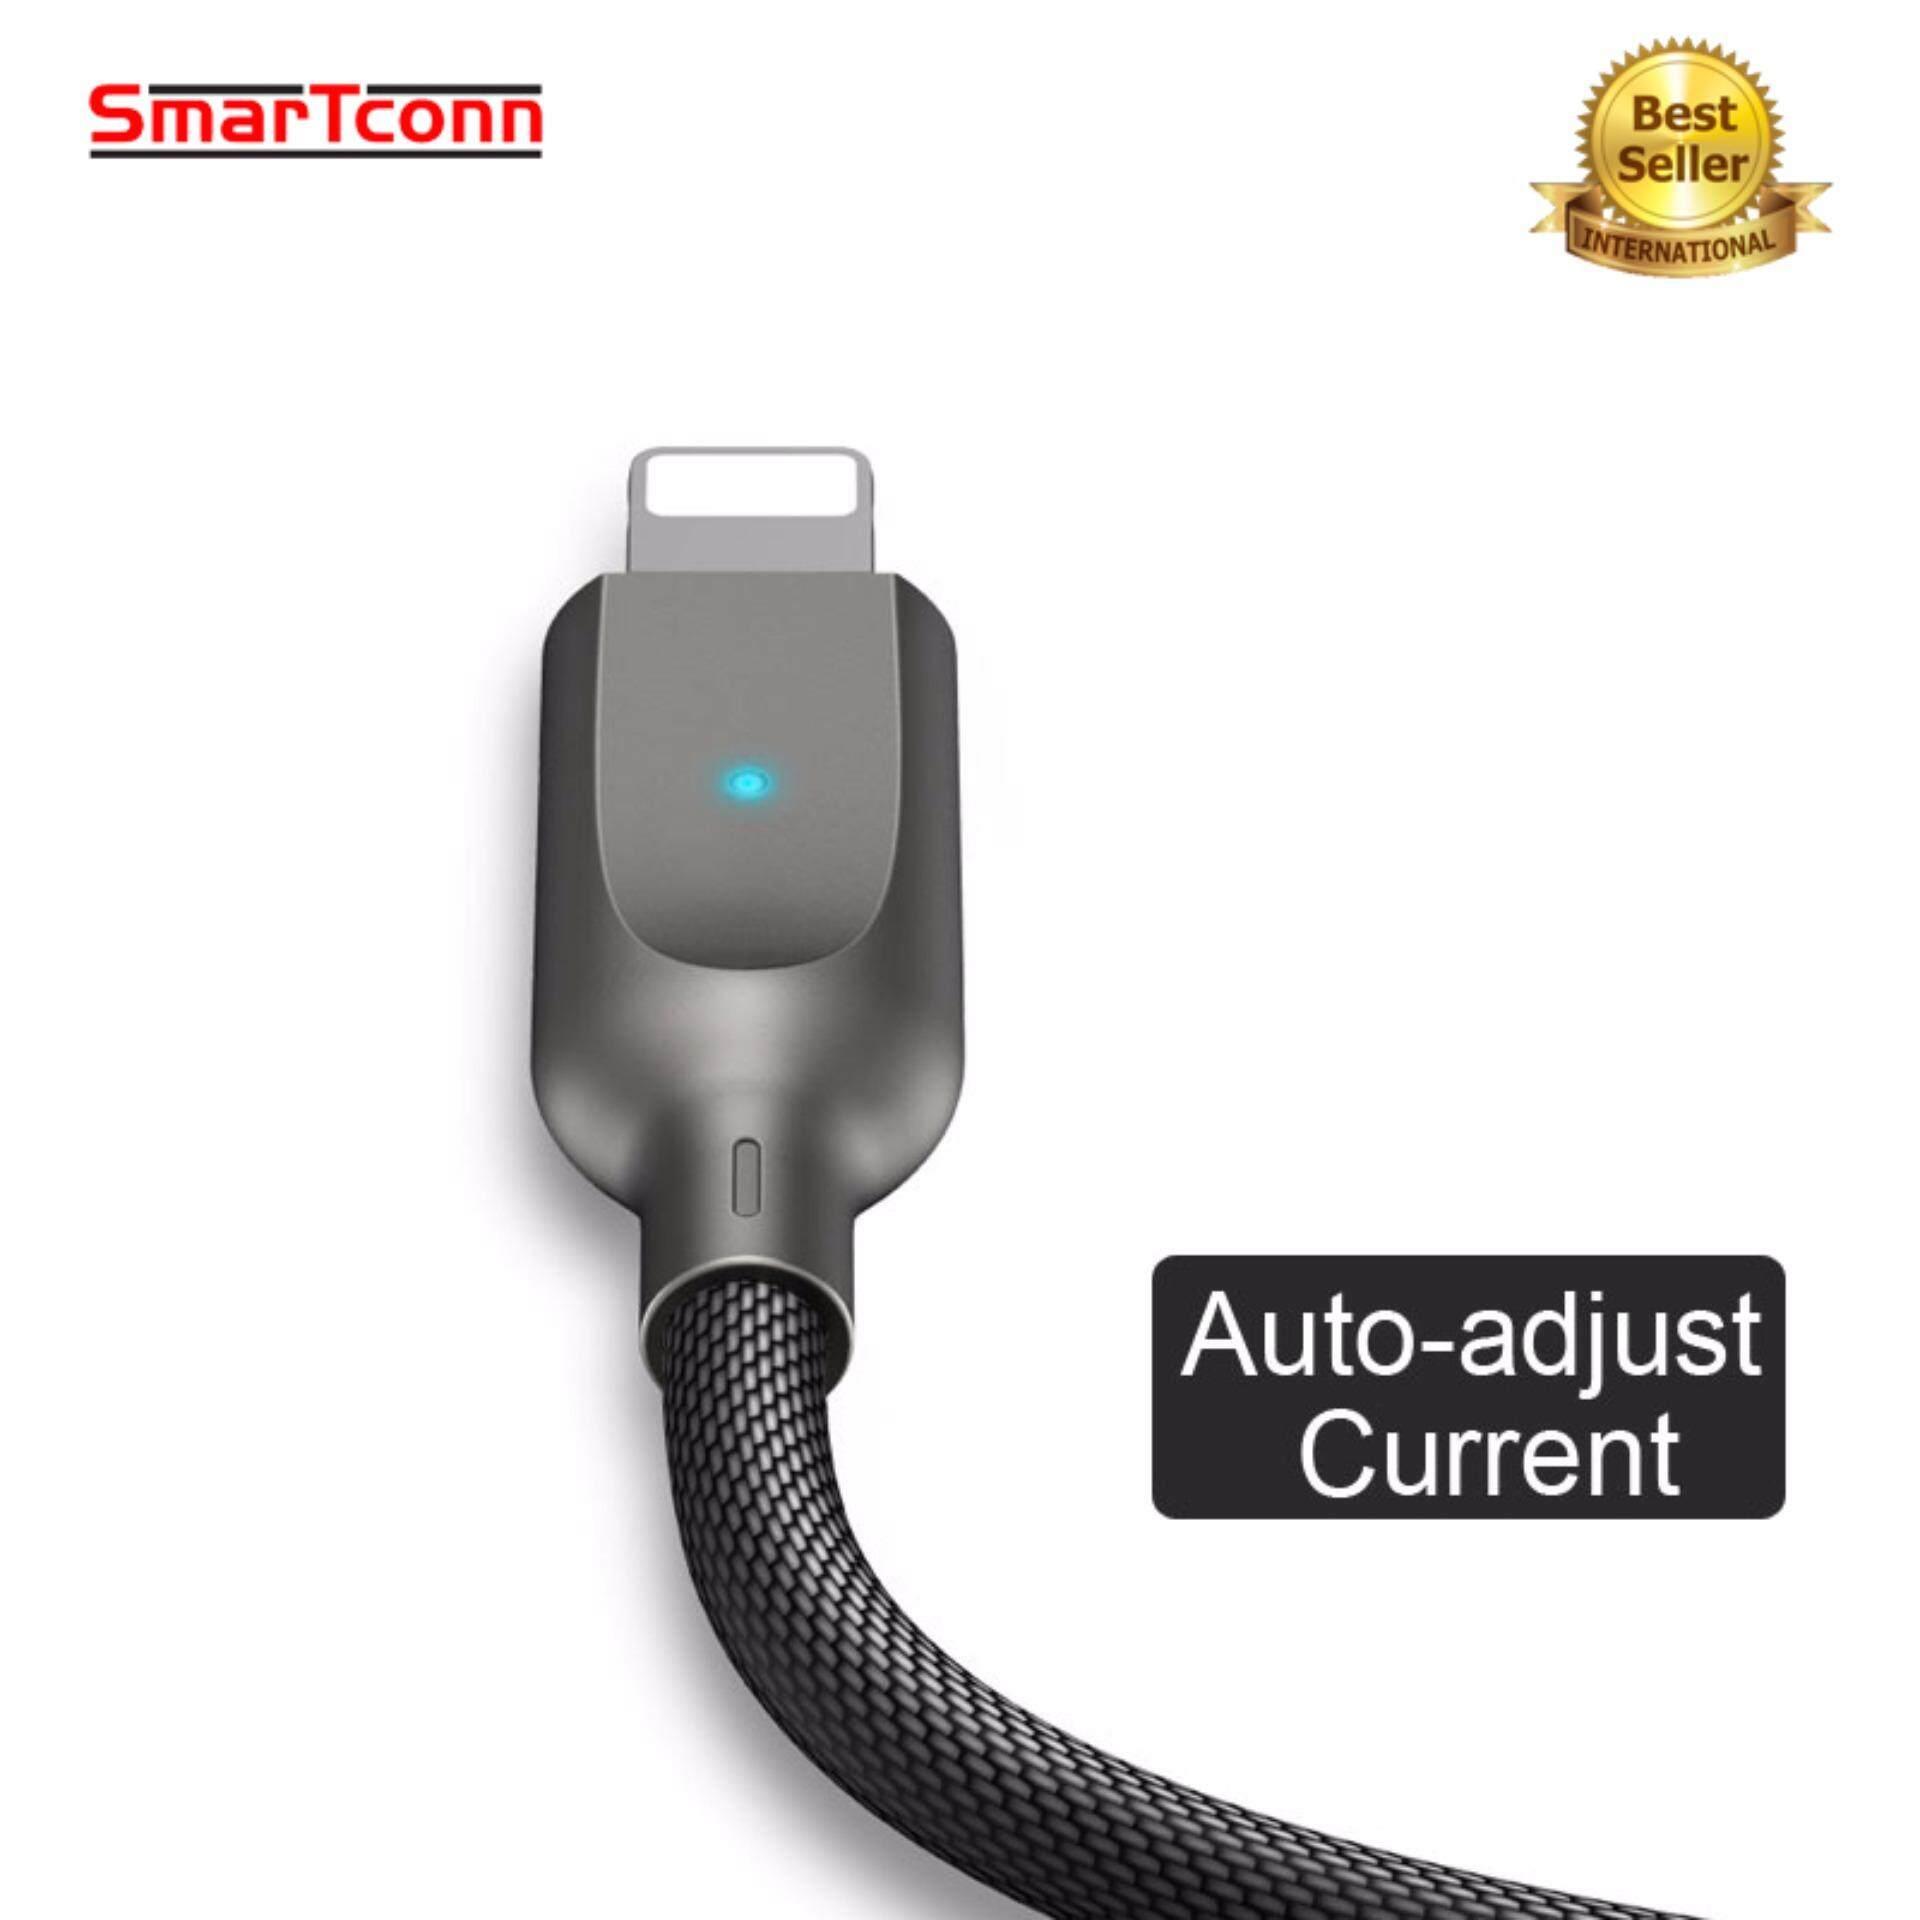 Mcdodo Zinc Knight 18m Auto Disconnect Lightning Data Cable Black 12m Smartconn Otomatis Putuskan Usb Lightnings Kabel Anda Apple X 8 7 6 Ipad Usams Telepon Ringan